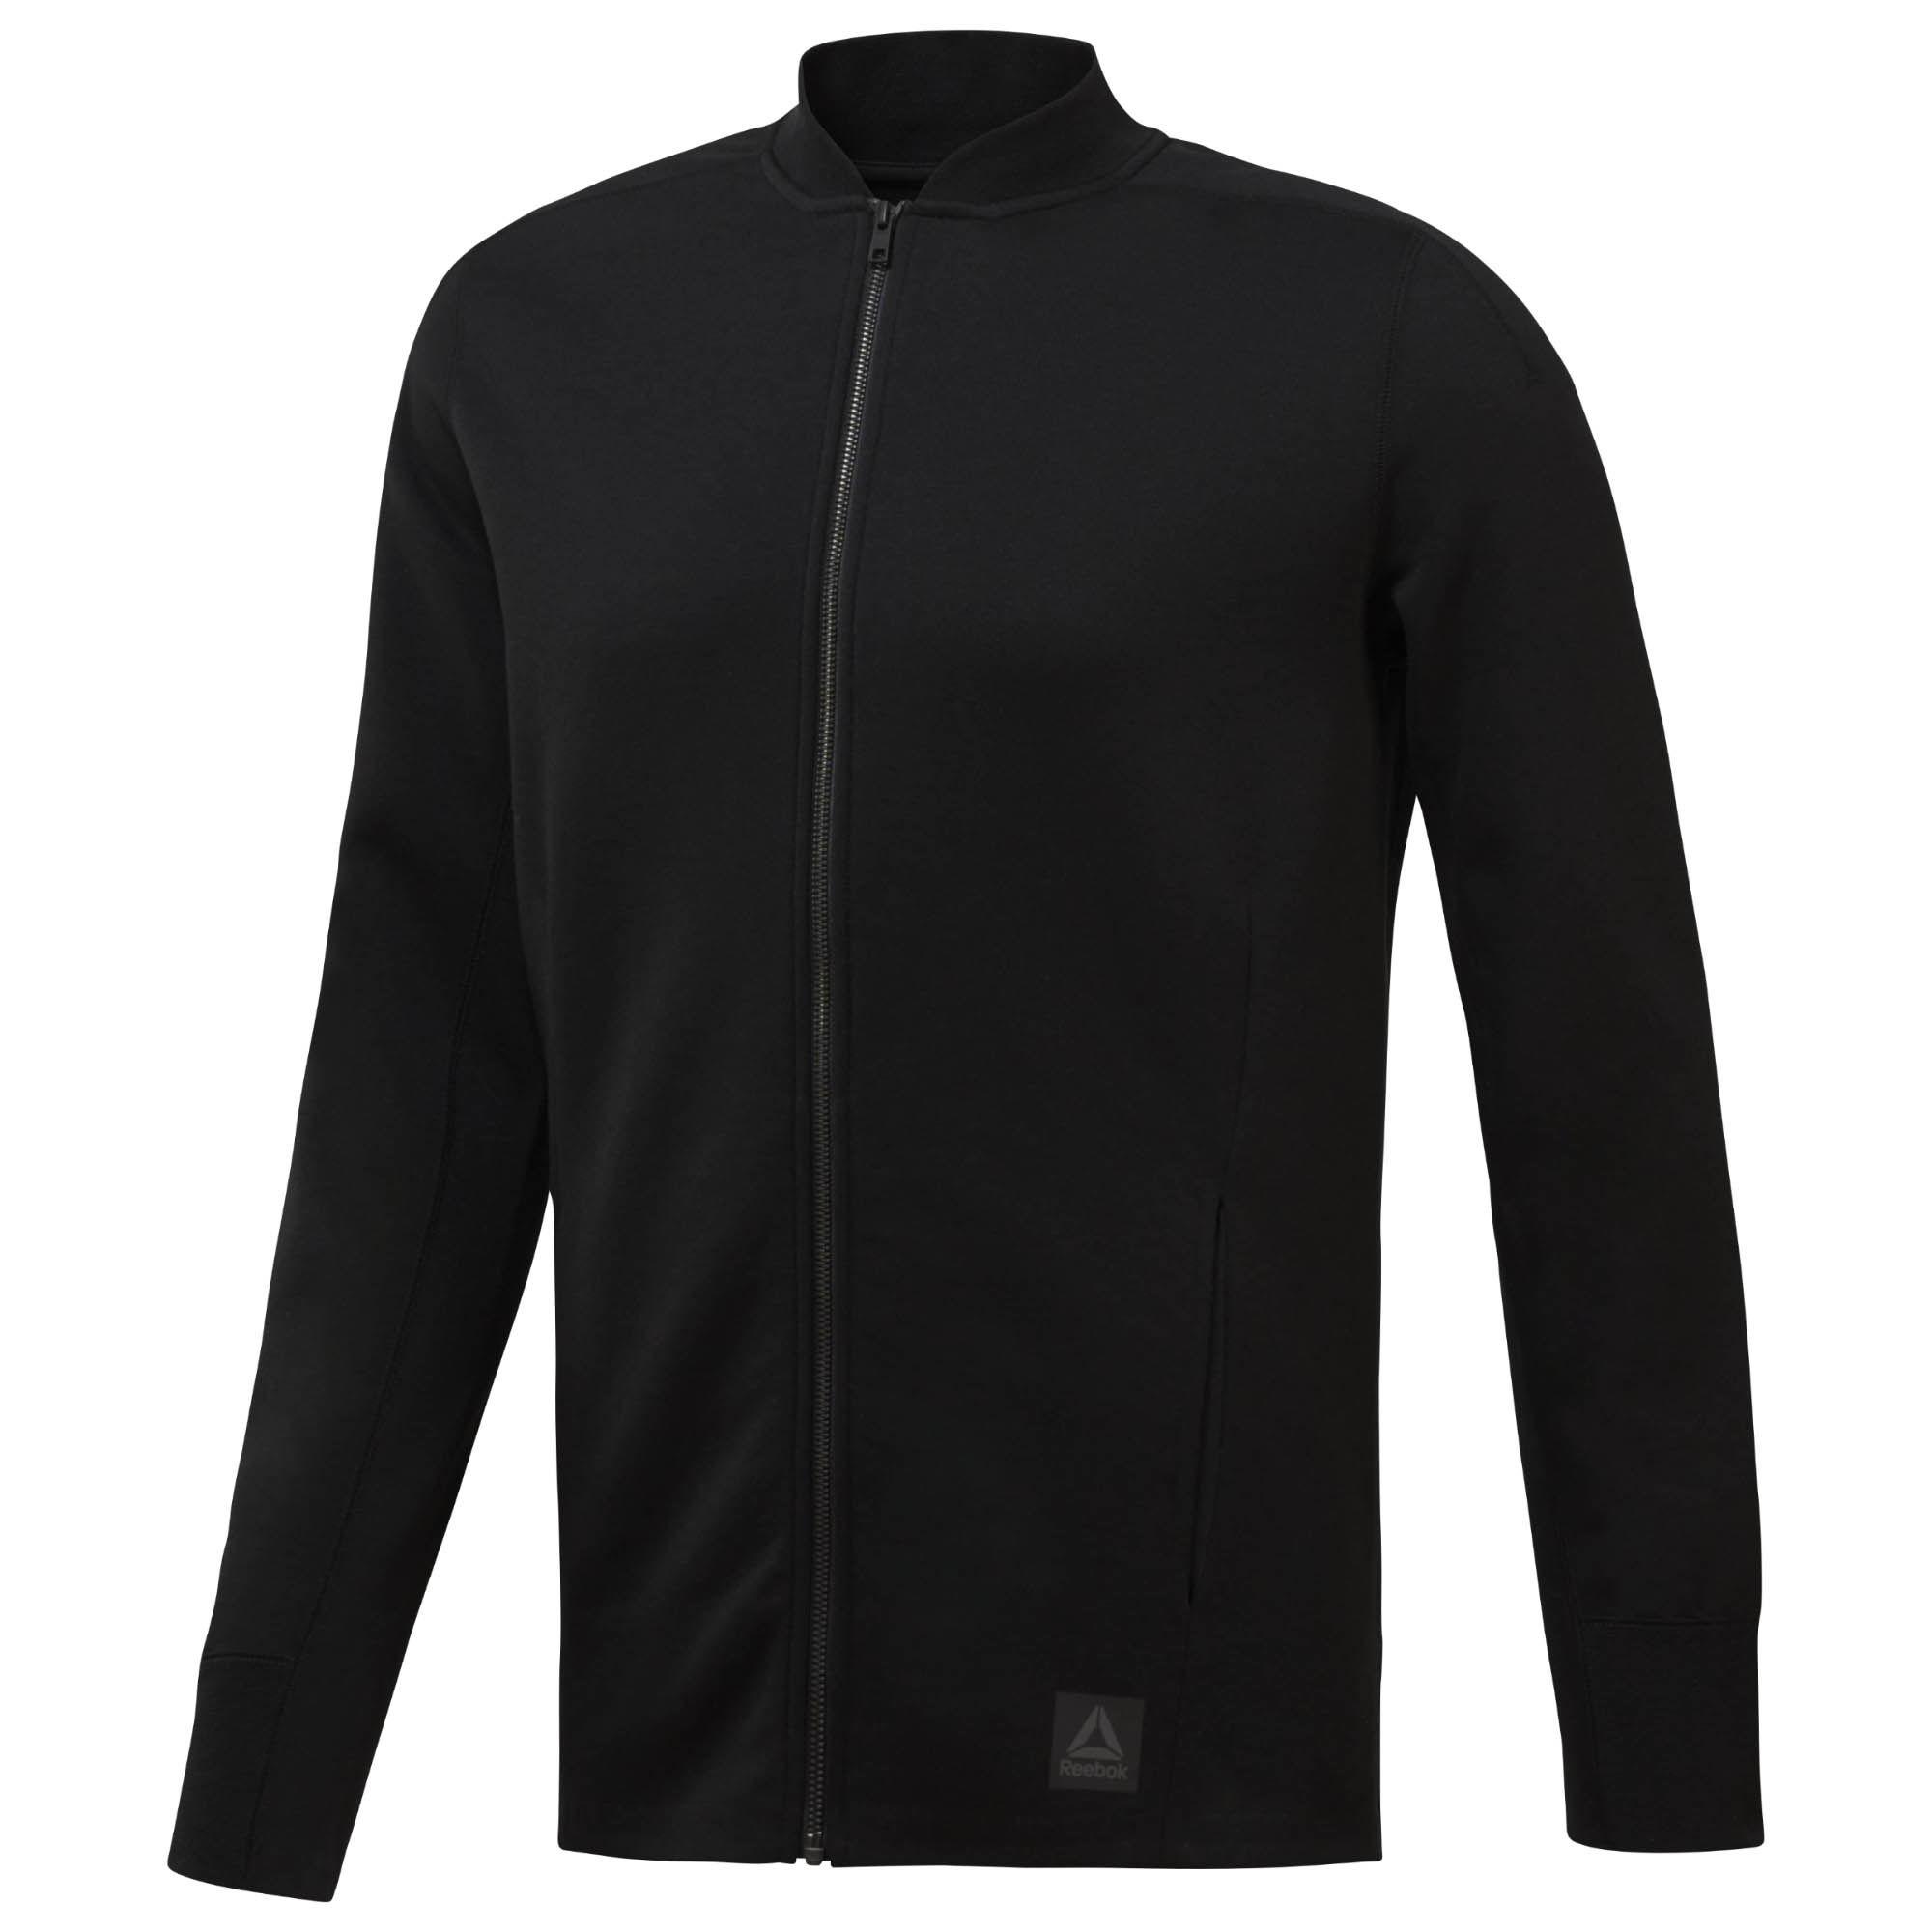 REEBOK TRAINING SUPPLY VARSITY 男裝 外套 針織 棒球外套 休閒 舒適 黑【運動世界】CV8196